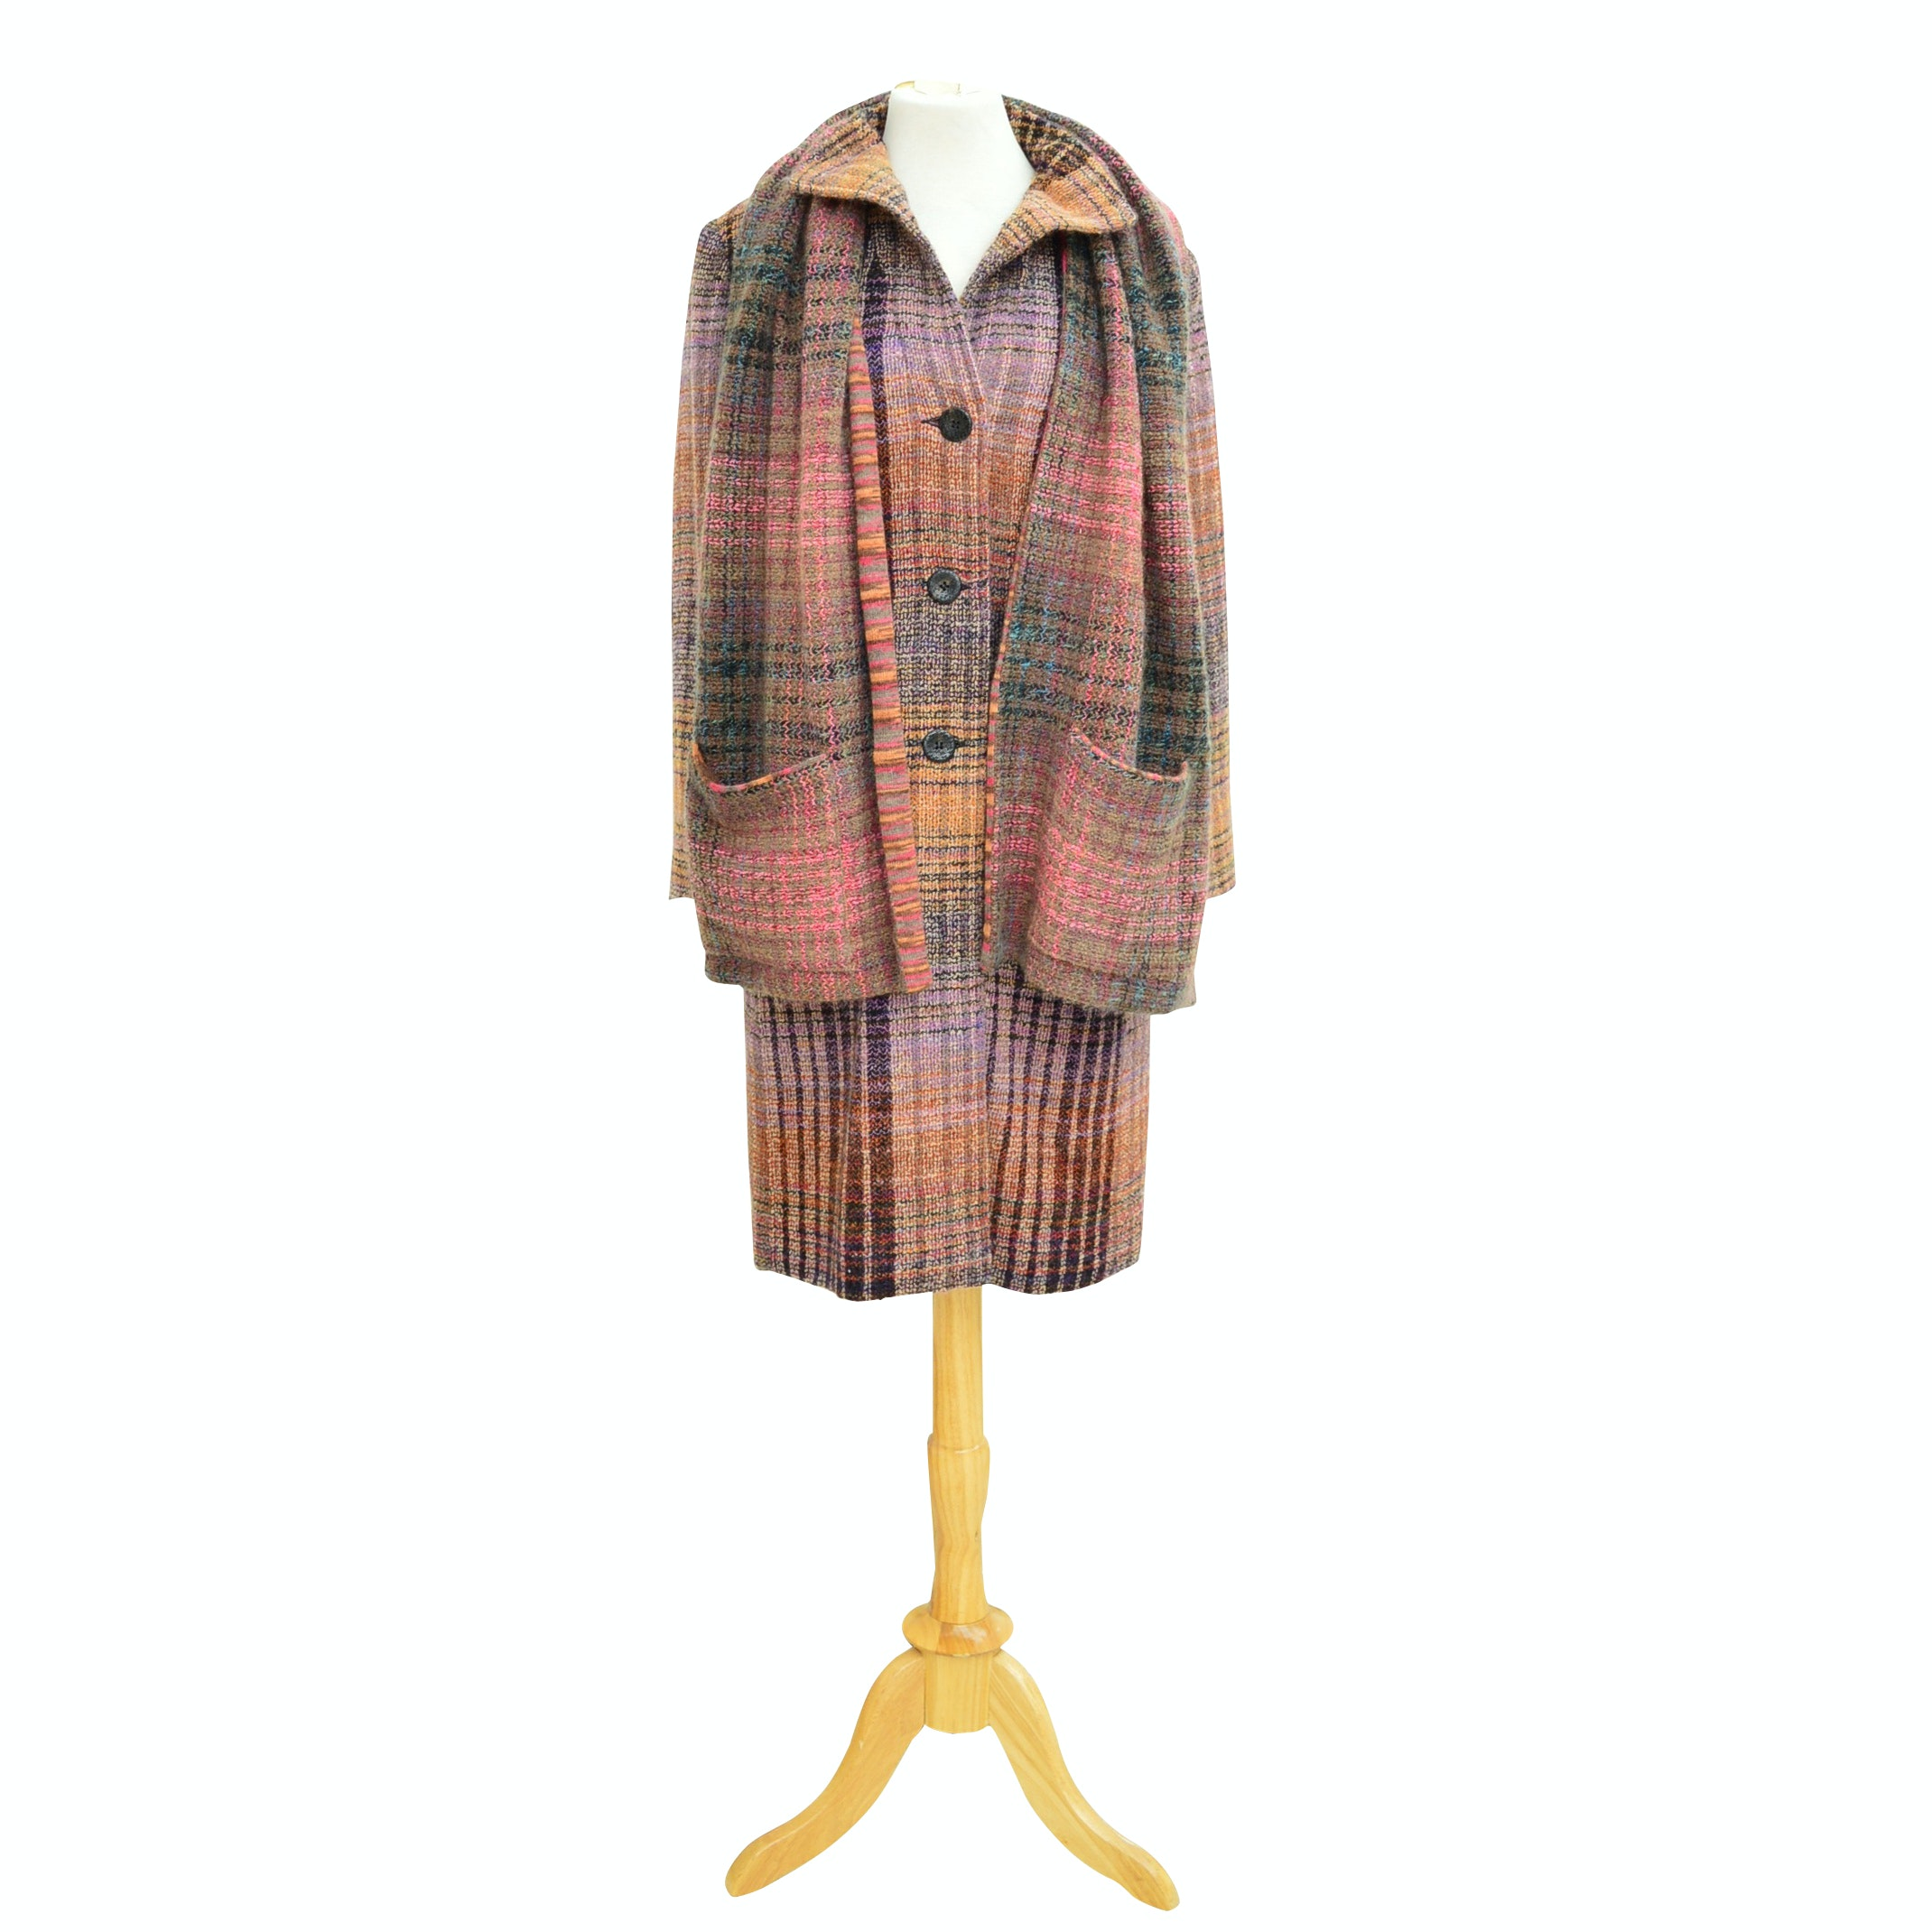 Missoni Orange Label Wool Knit Peacoat and Scarf